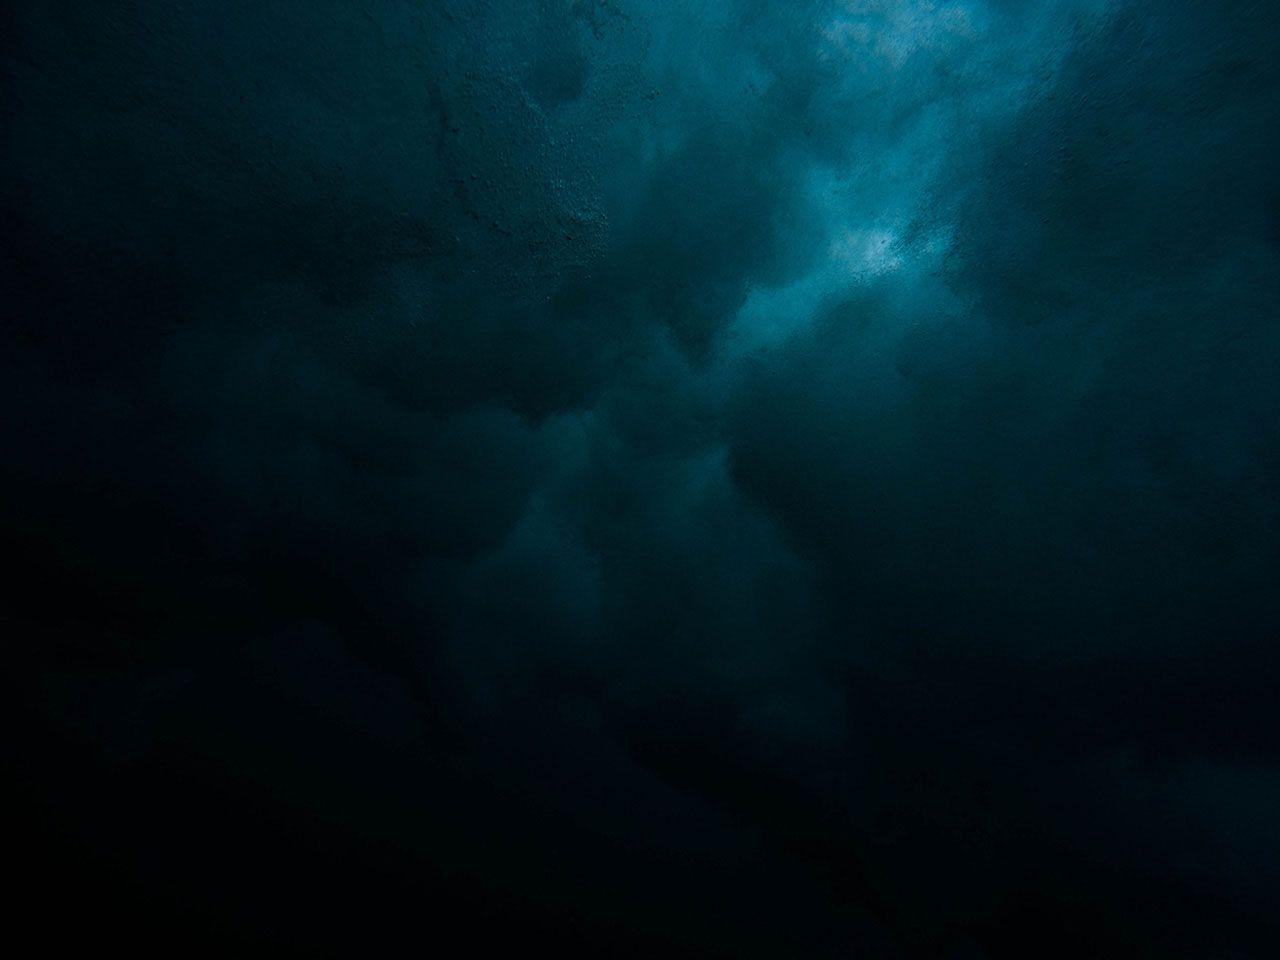 خلفيات فوتوشوب Hd Texture Images Dark Backgrounds Dark Wallpaper